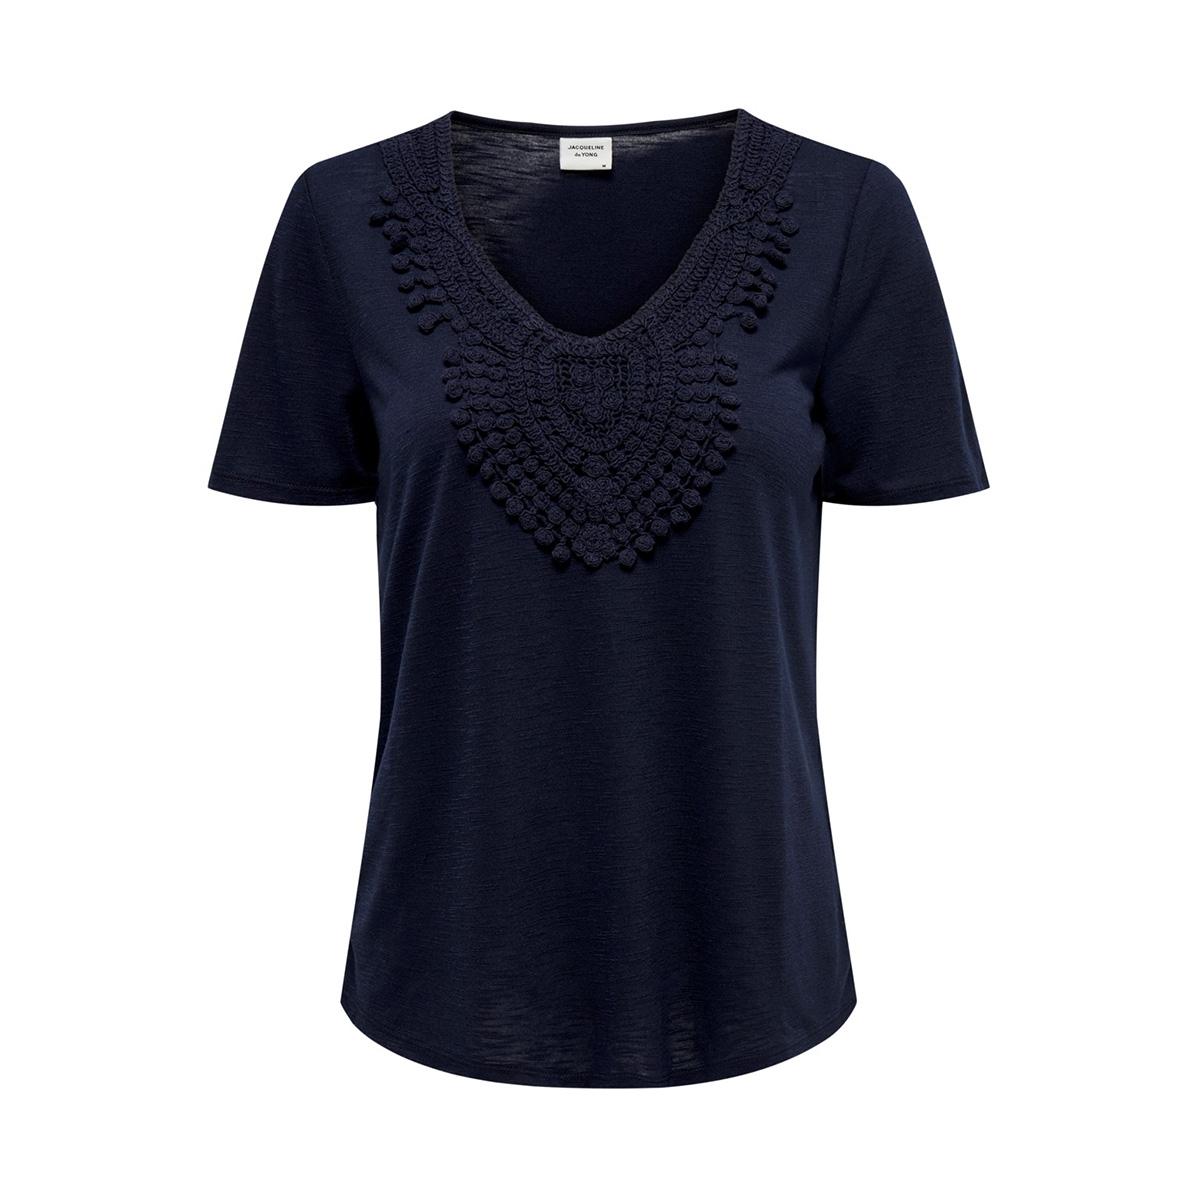 jdydodo s/s top jrs 15154568 jacqueline de yong t-shirt navy blazer/dtm croche